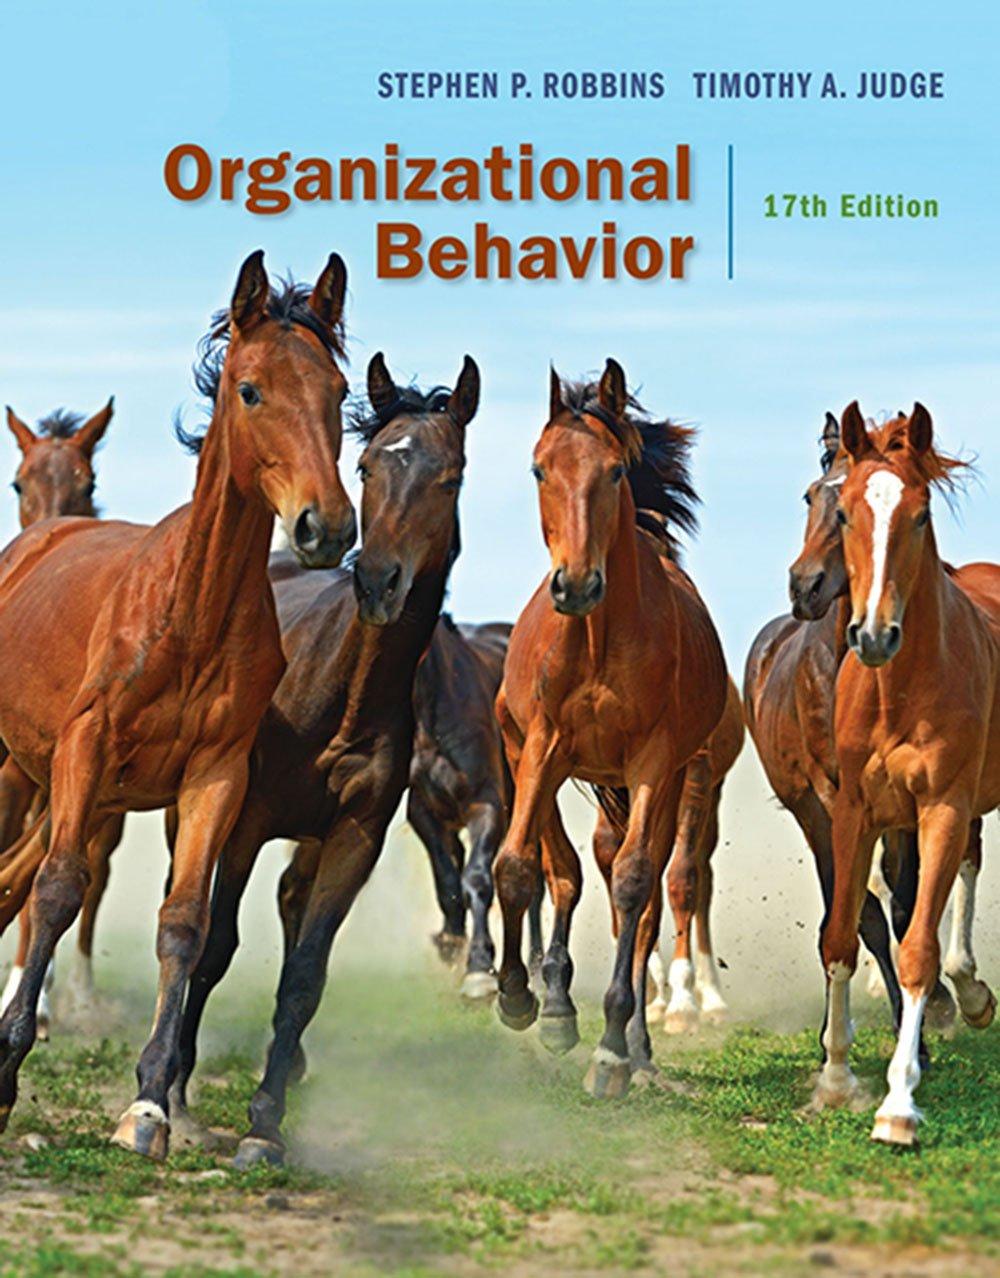 Organizational Behavior 17th Edition Pdf Free